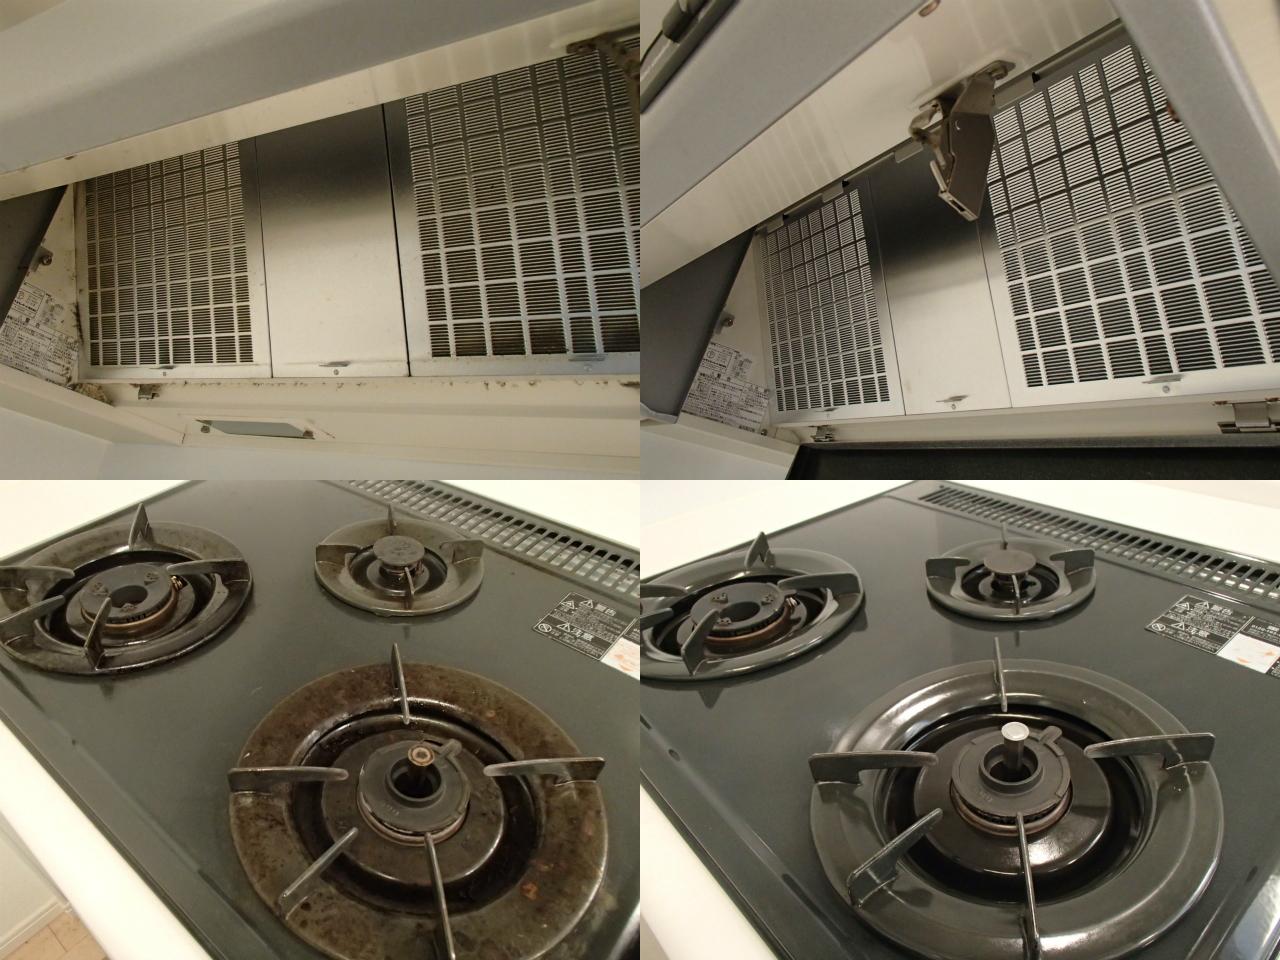 http://ajras.net/images/121227-kitchen.jpg